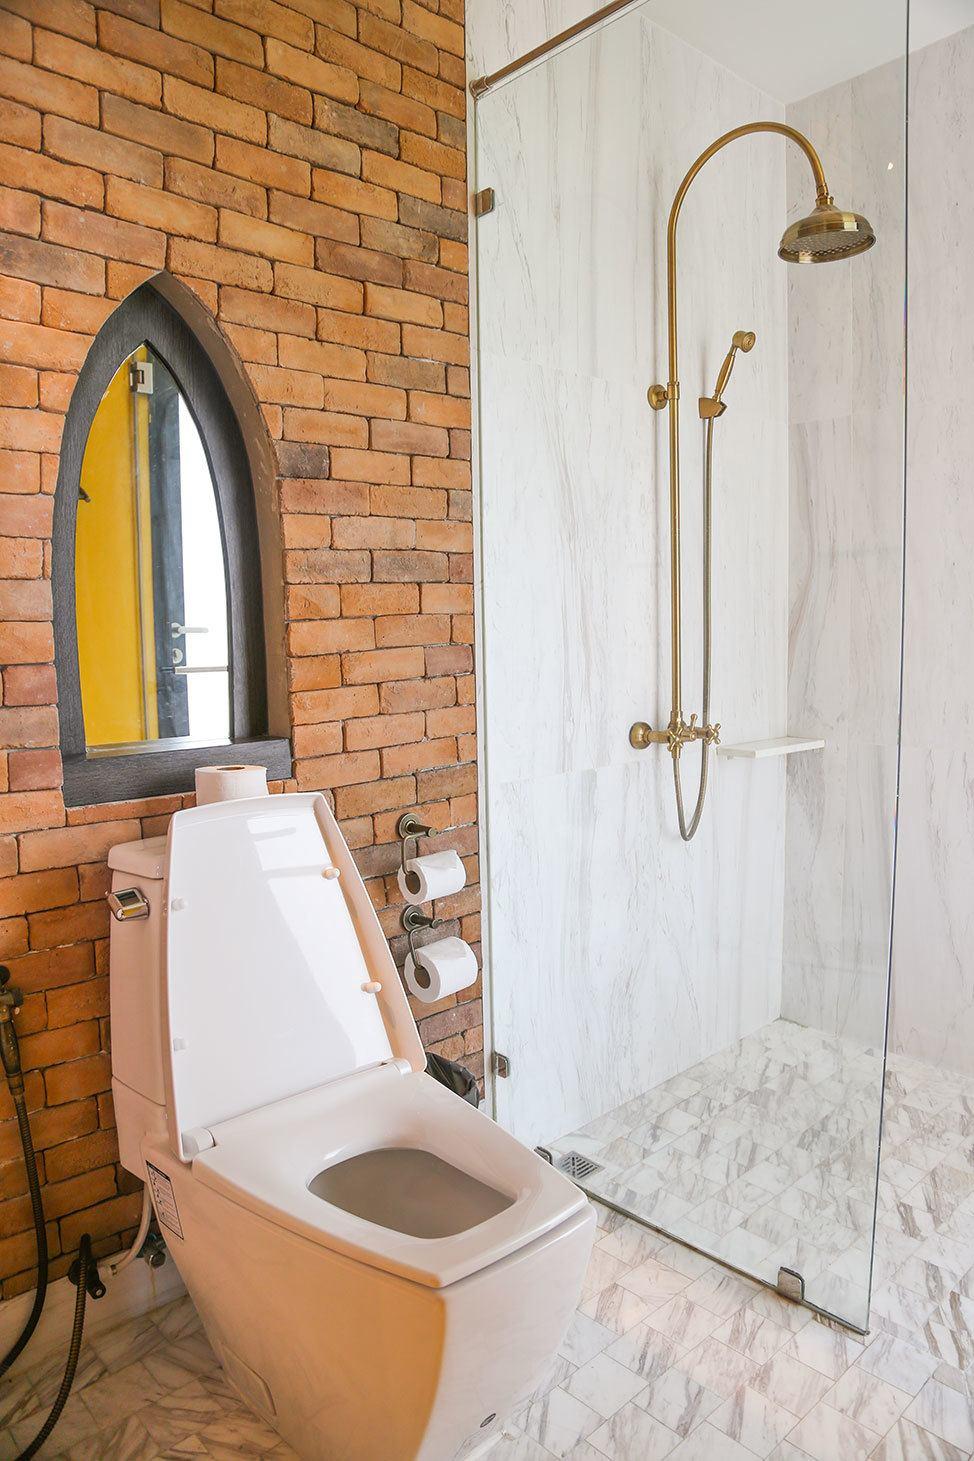 Bathroom at Iudia Hotel, Ayutthaya, Thailand